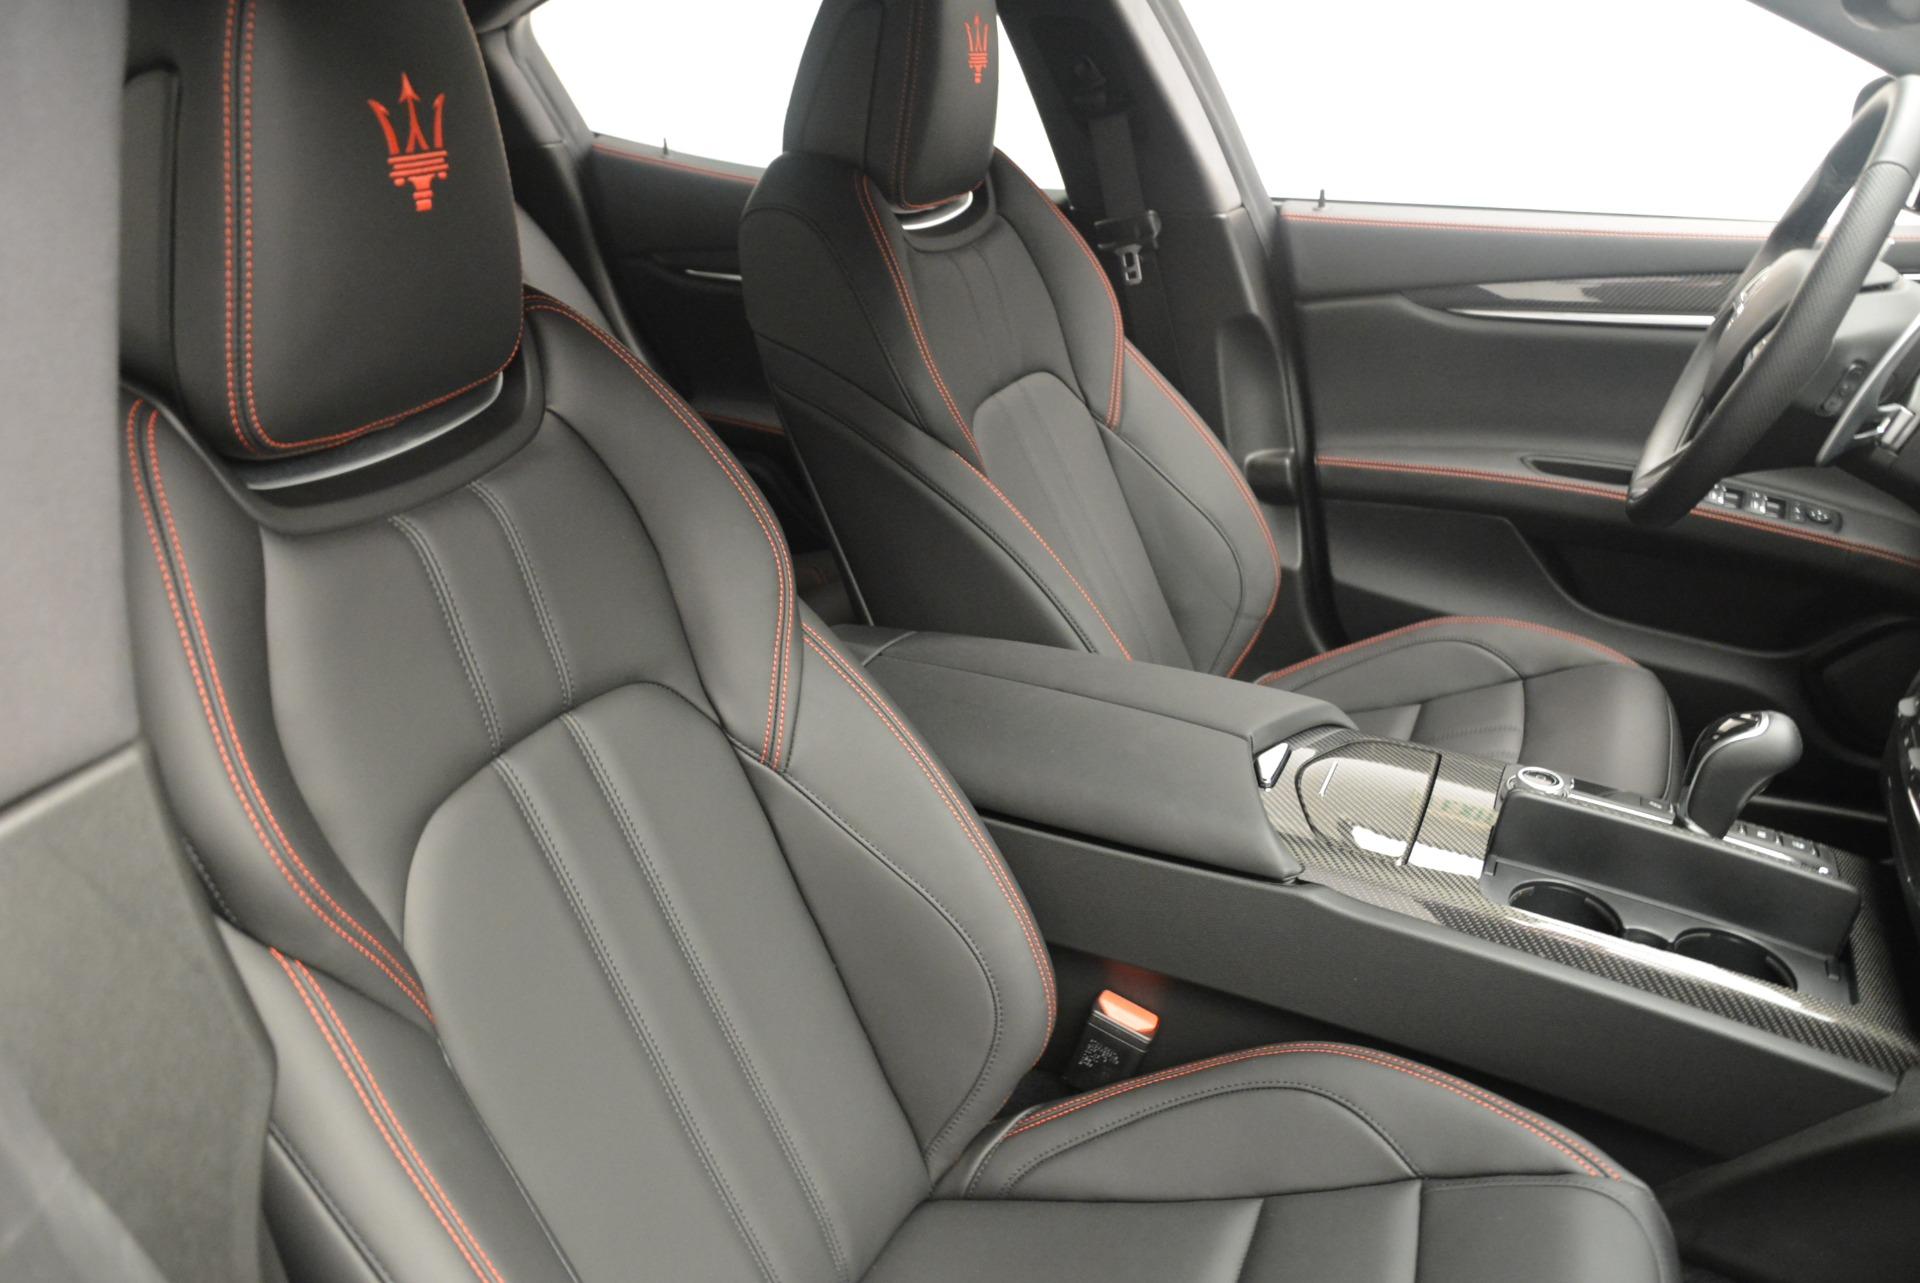 New 2018 Maserati Ghibli SQ4 GranSport Nerissimo For Sale In Westport, CT 2372_p22